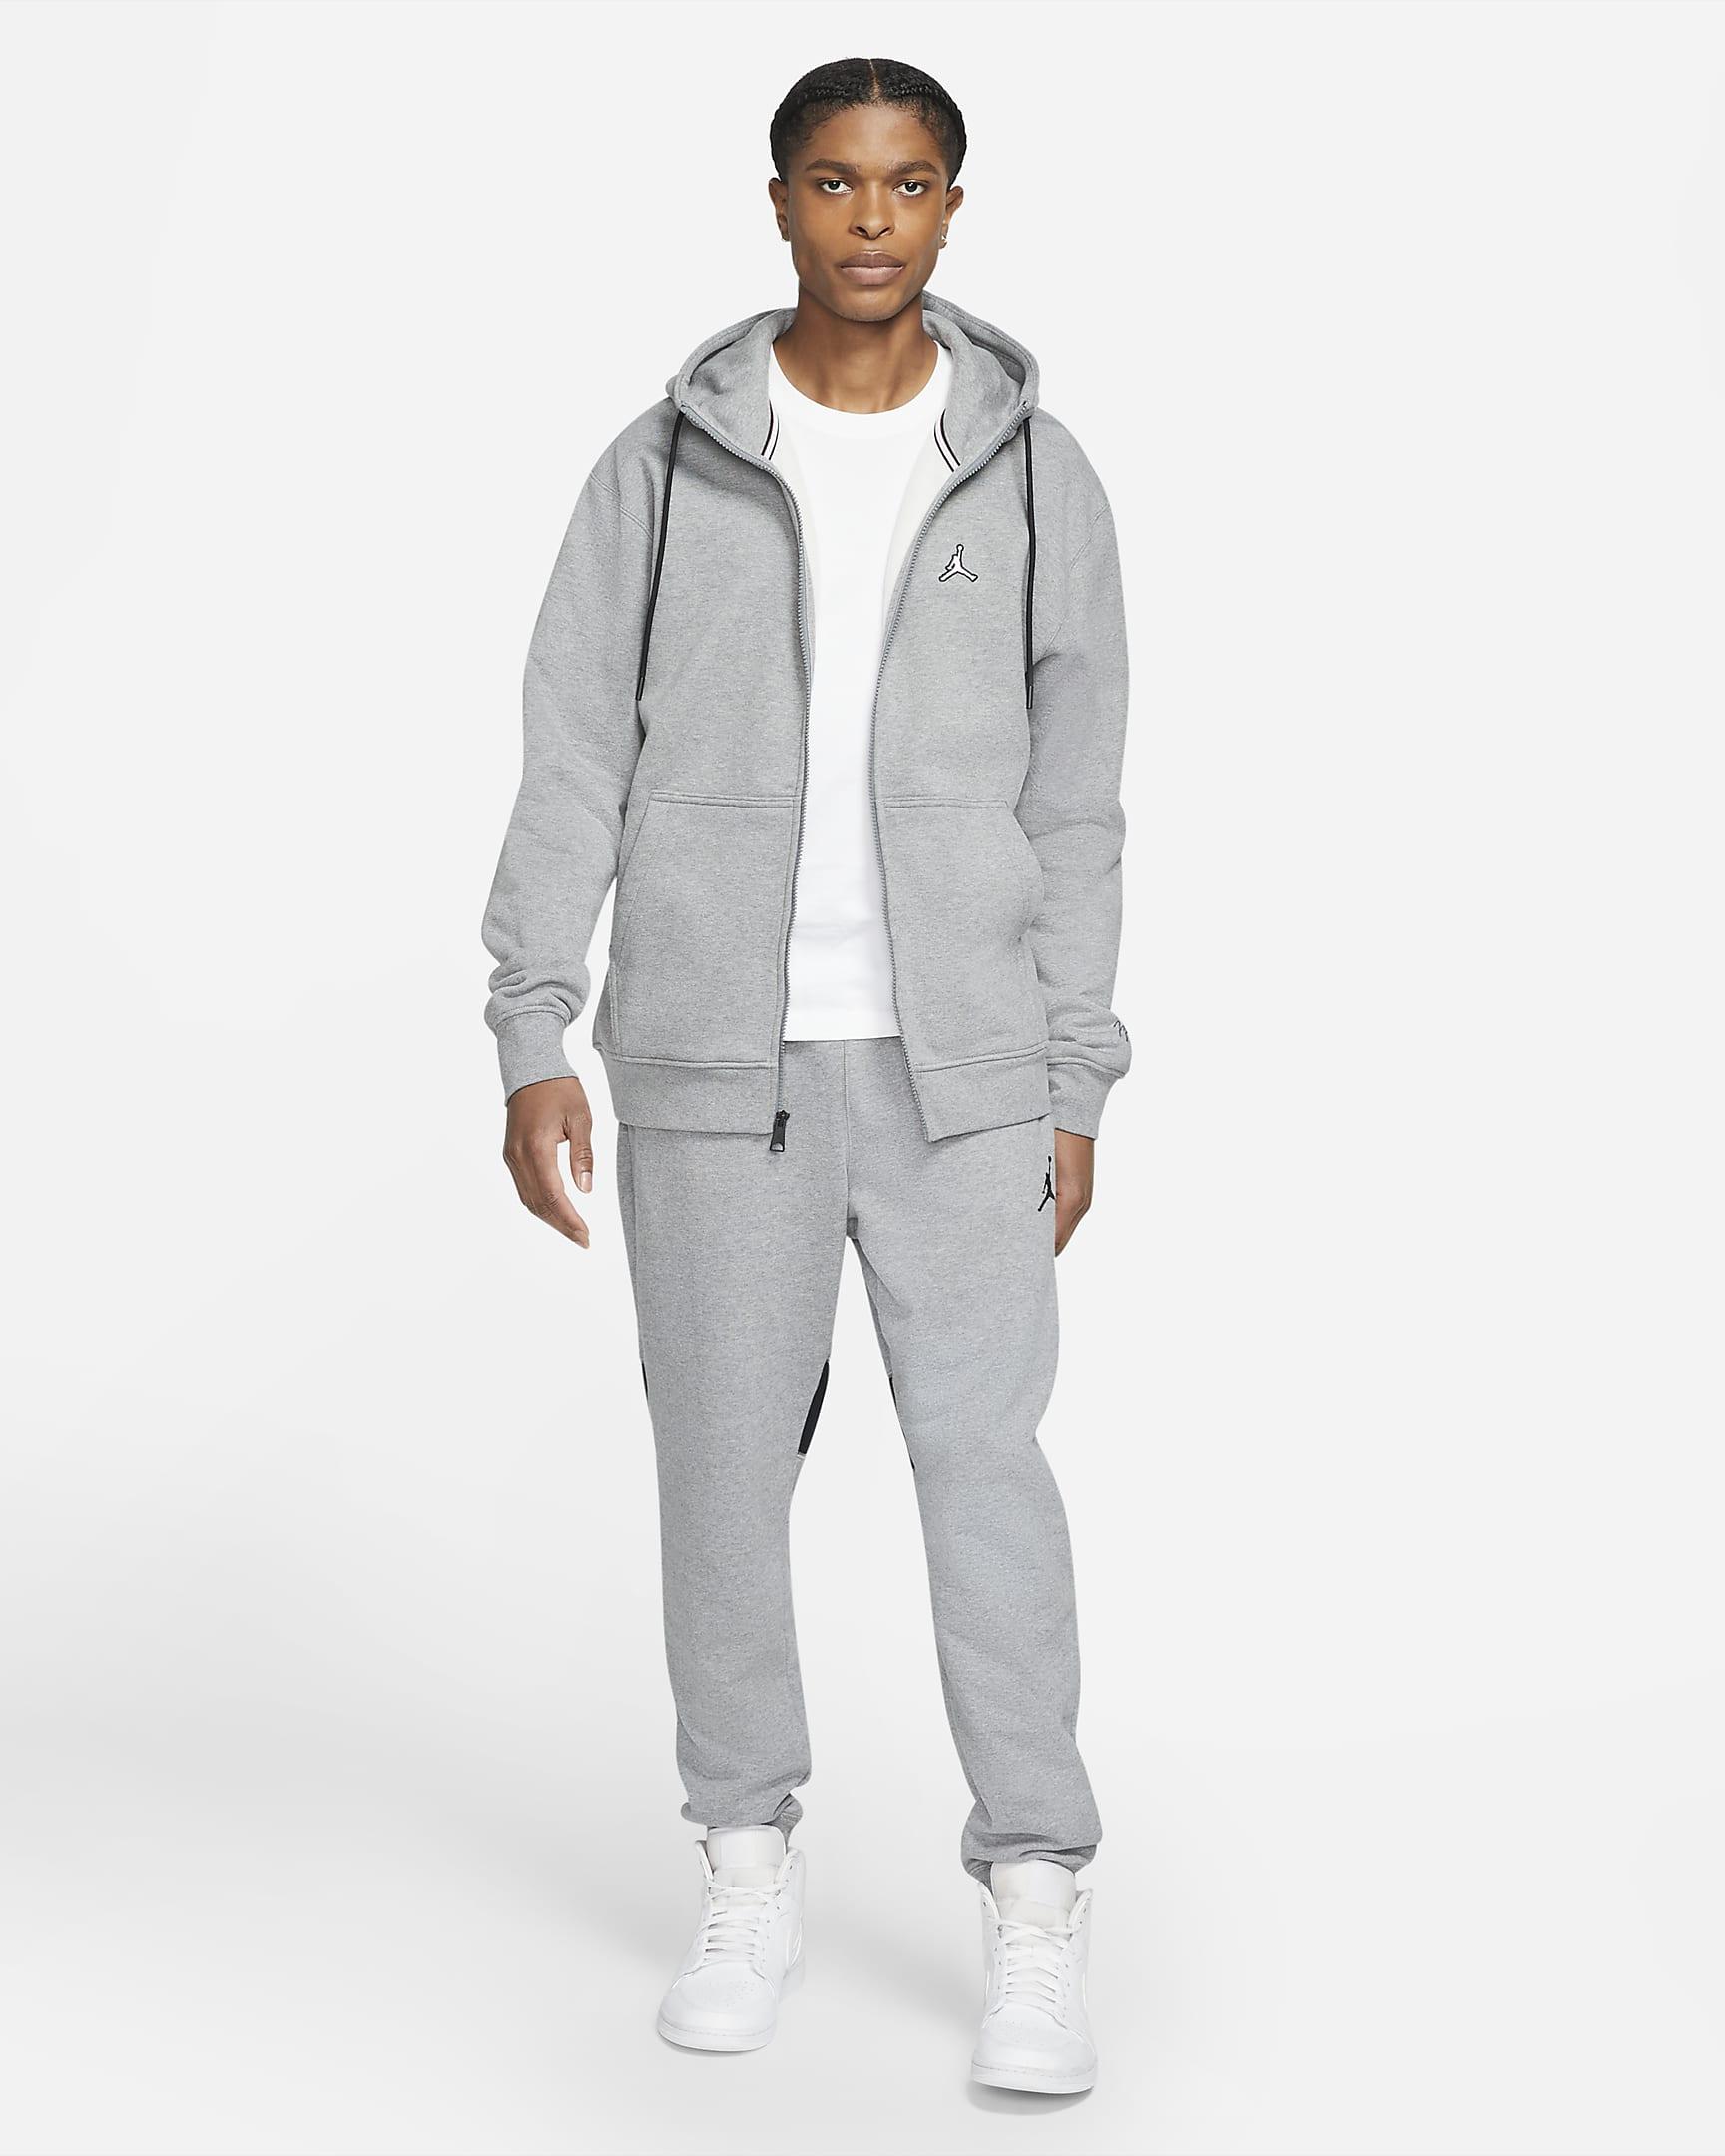 jordan-essentials-mens-fleece-full-zip-hoodie-DKJfG9-4.png